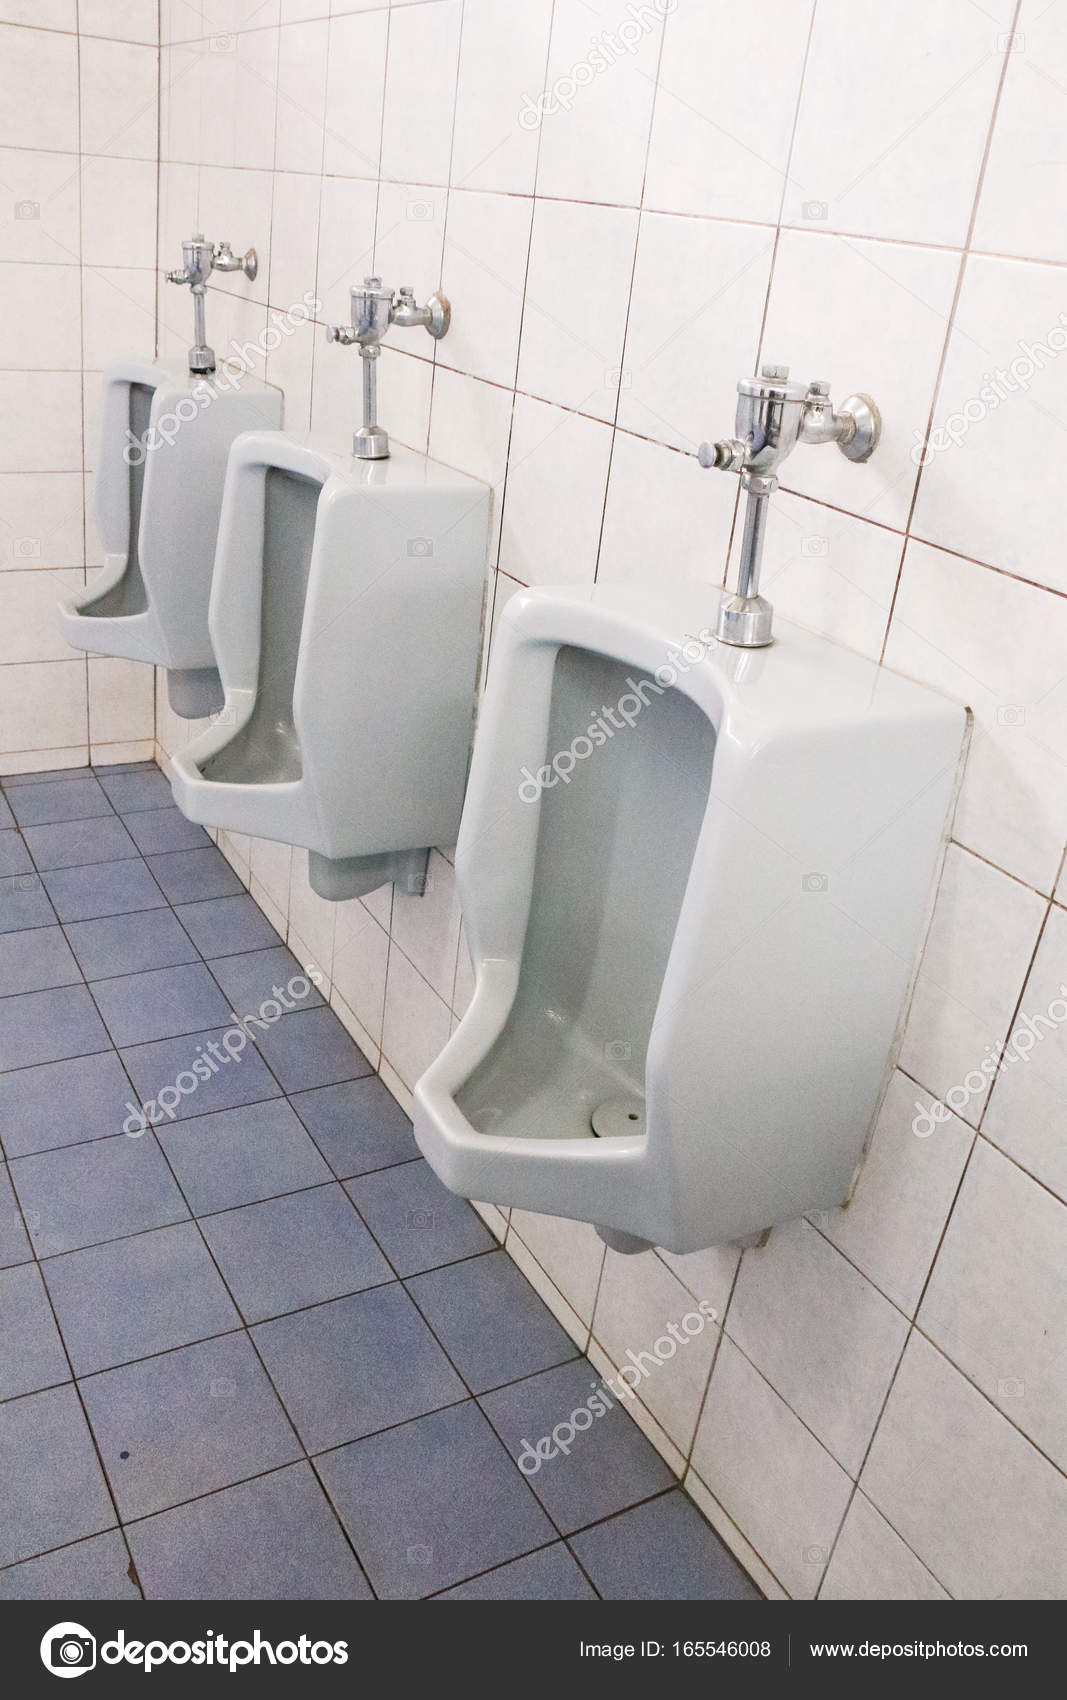 Menu0027s Bathroom, Design Of White Ceramic Urinals For Men U2014 Stock Photo